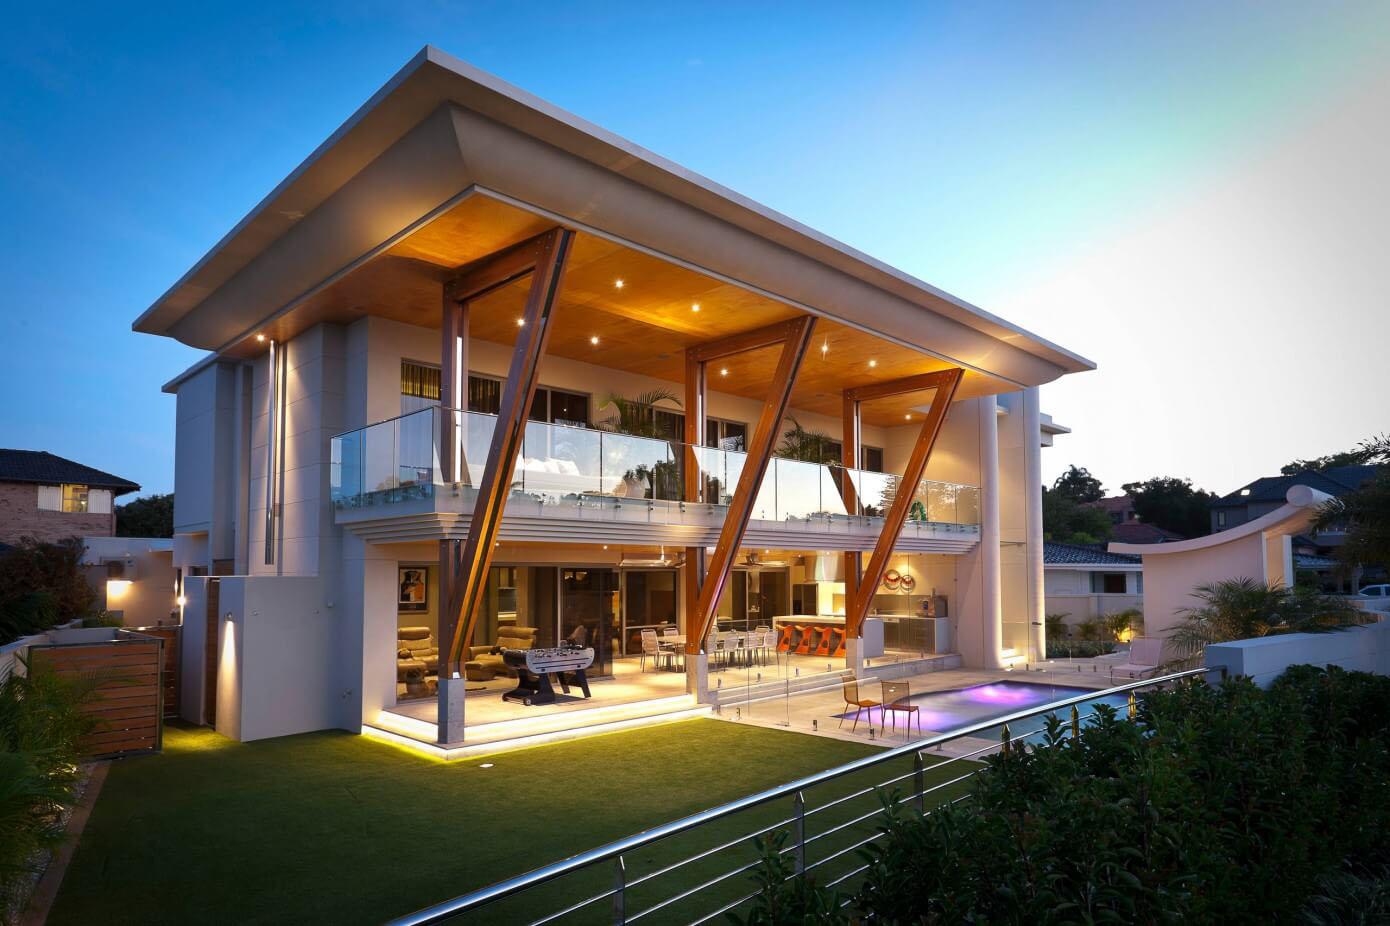 modern home perth large roof idesignarch interior design architecture home design beautiful home design ideas house